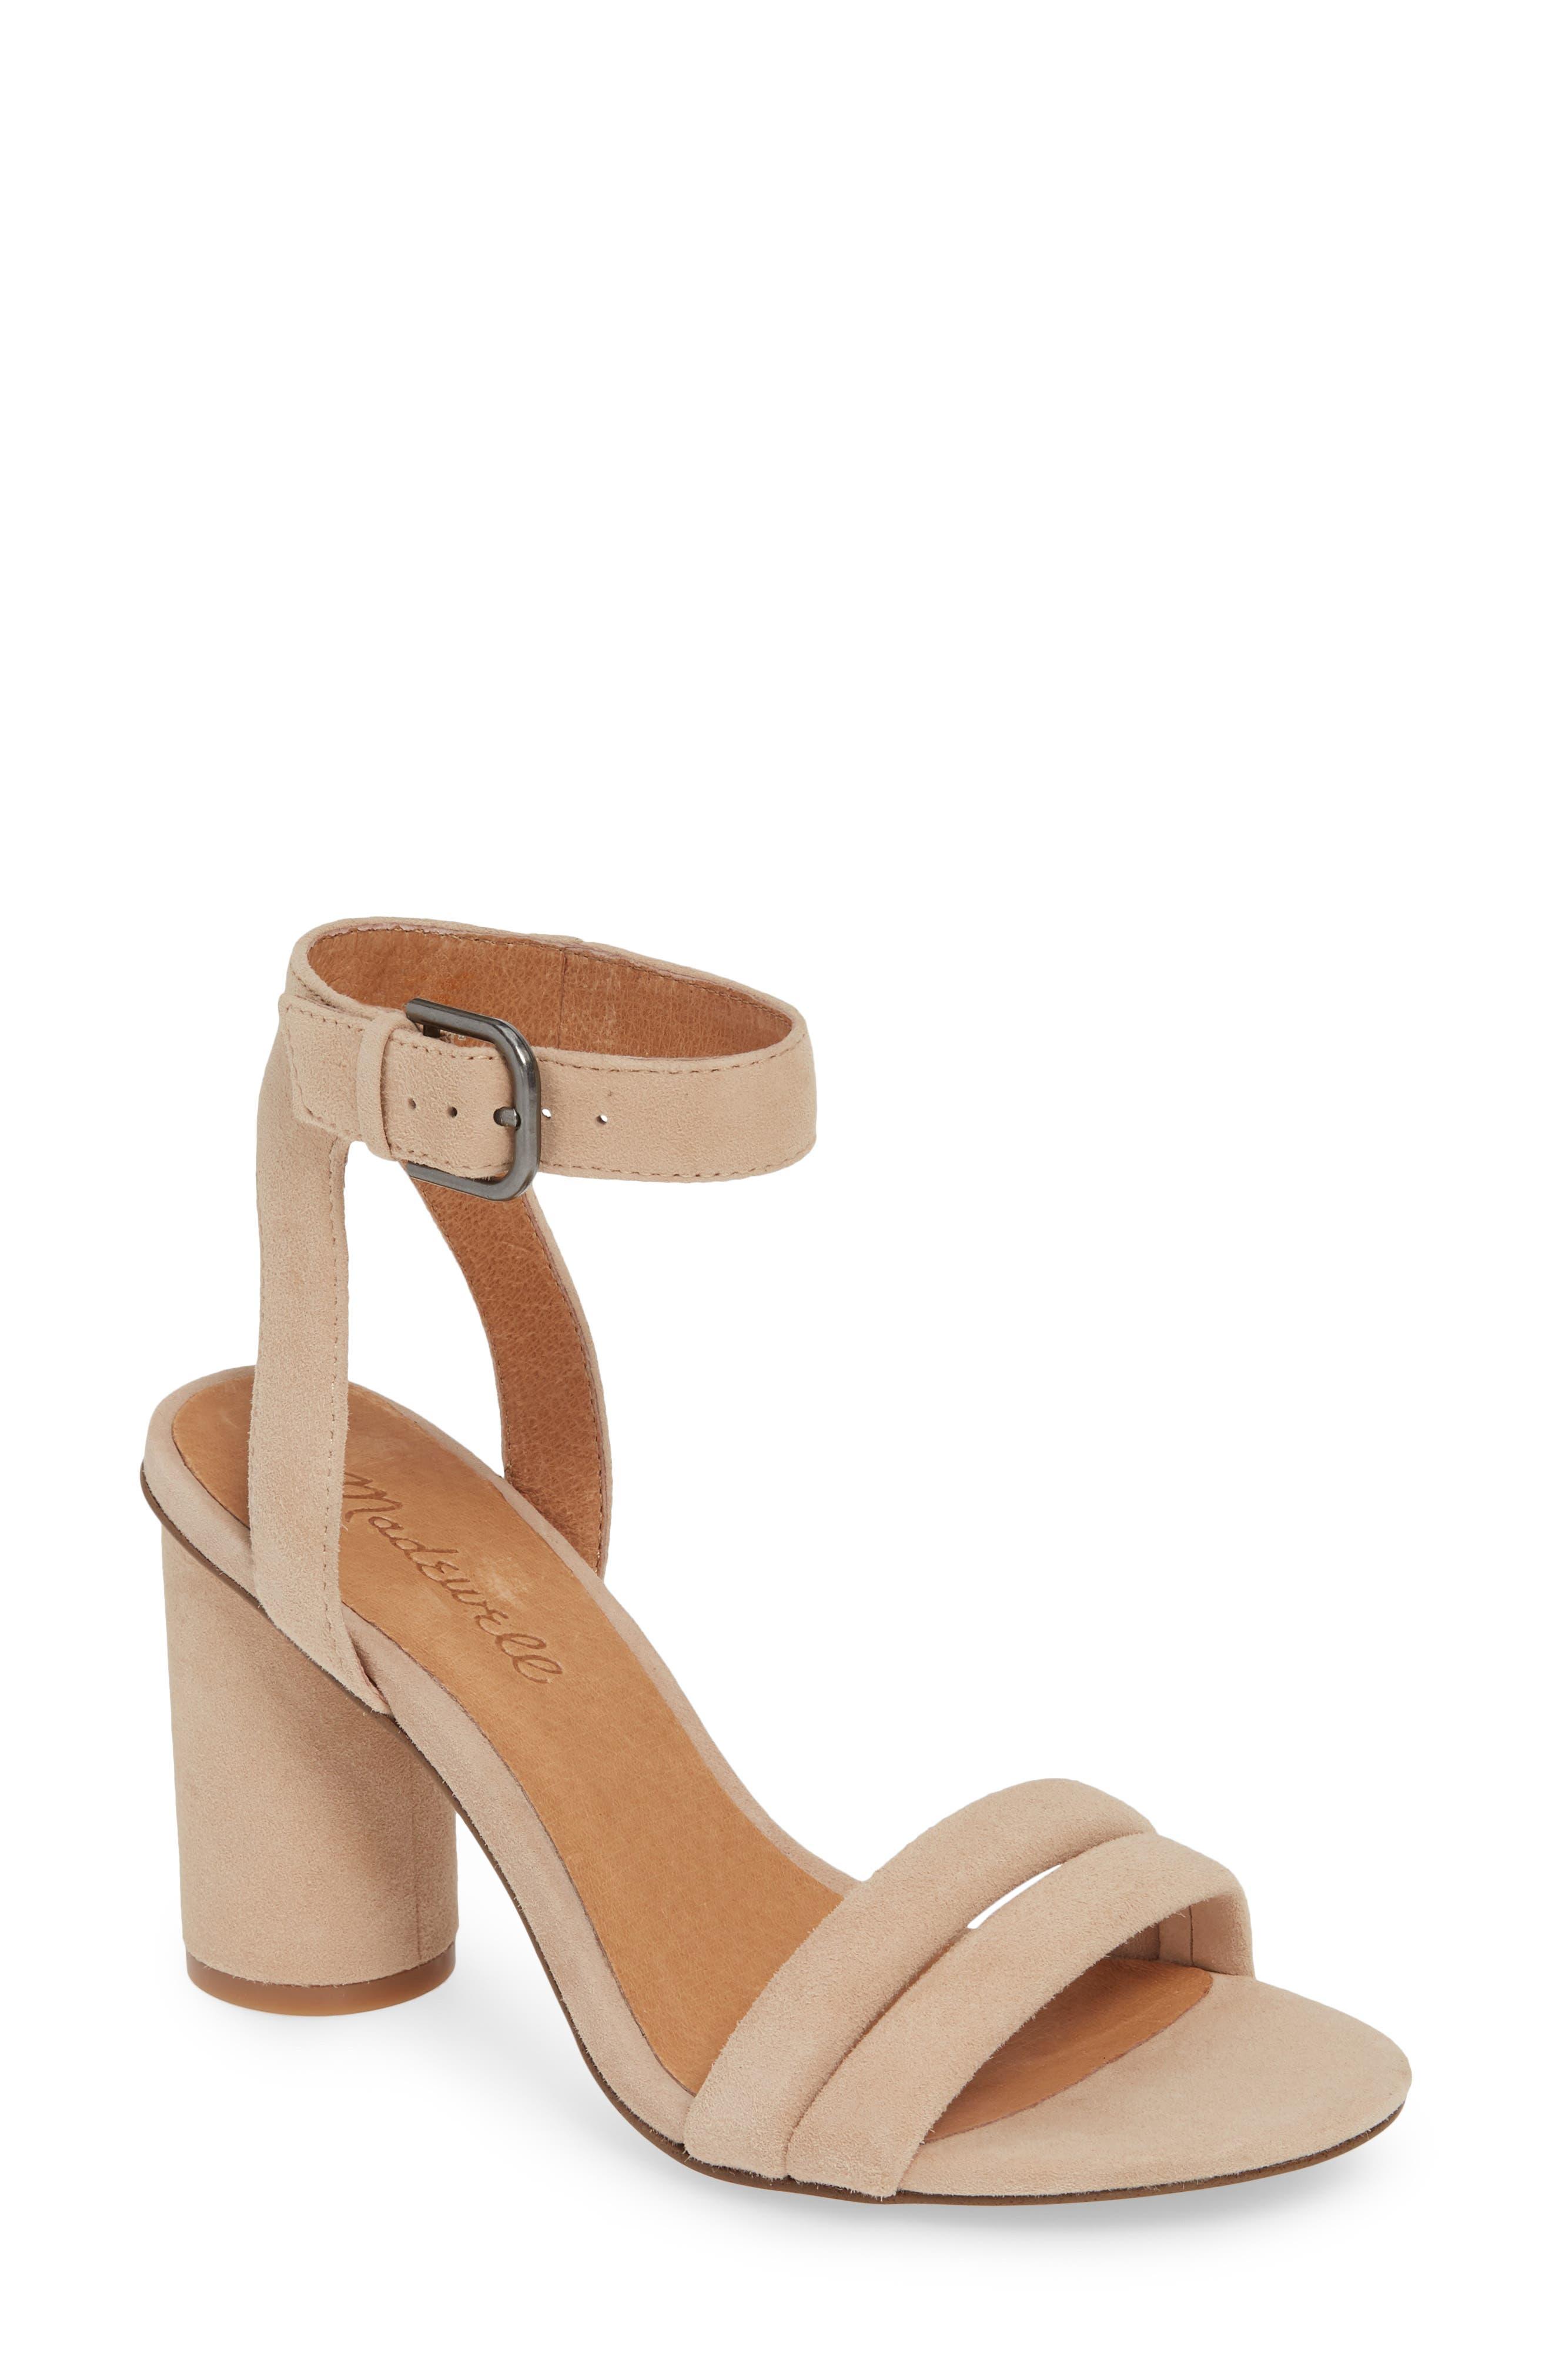 Madewell The Rosalie High Heel Sandal, Beige